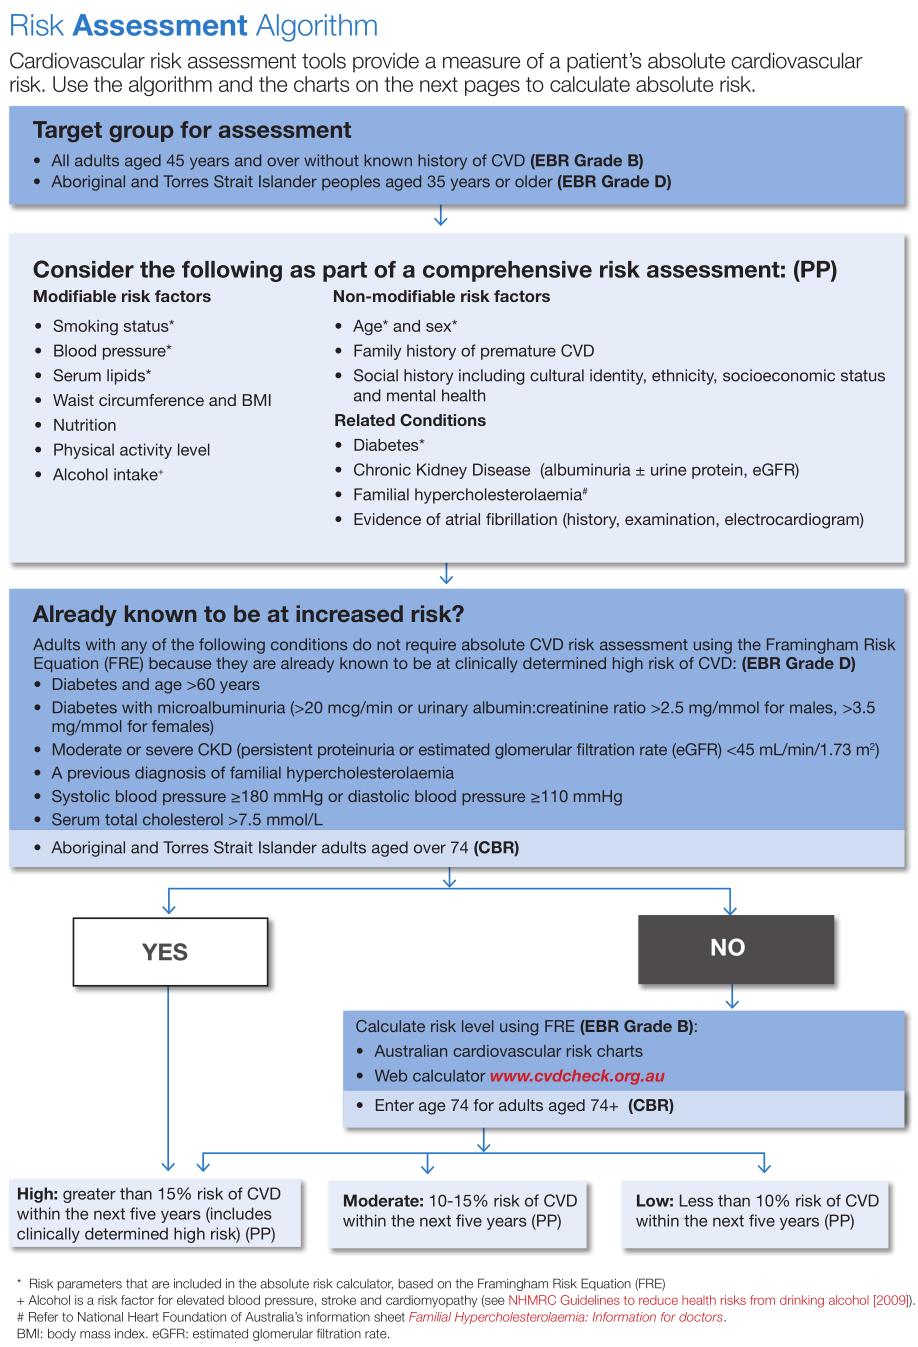 CV (Cardiovascular) Event Risk - CAT GUIDES - PenCS Help